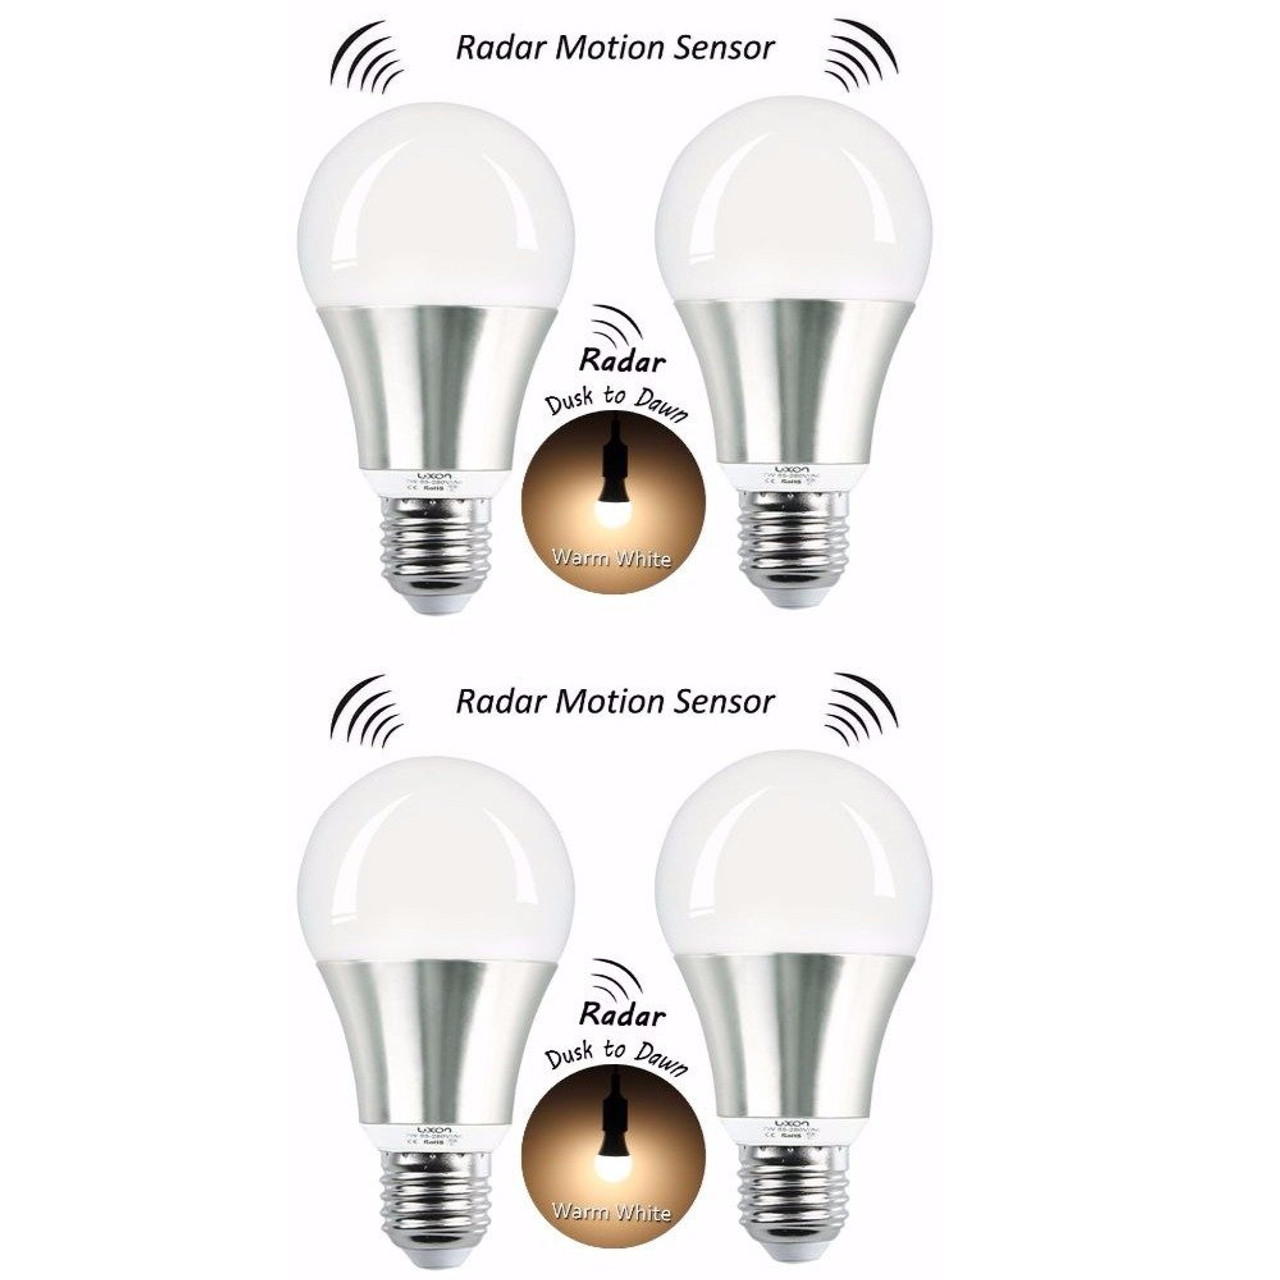 New Luxon Motion Sensor Light Bulb 7w Smart Bulb Radar Dusk To Dawn Led Motion Sensor Light Bulbs E26 Base Indoor Sensor Night Lights Soft White 2700k Outdoor Motion Sensor Bulb Auto